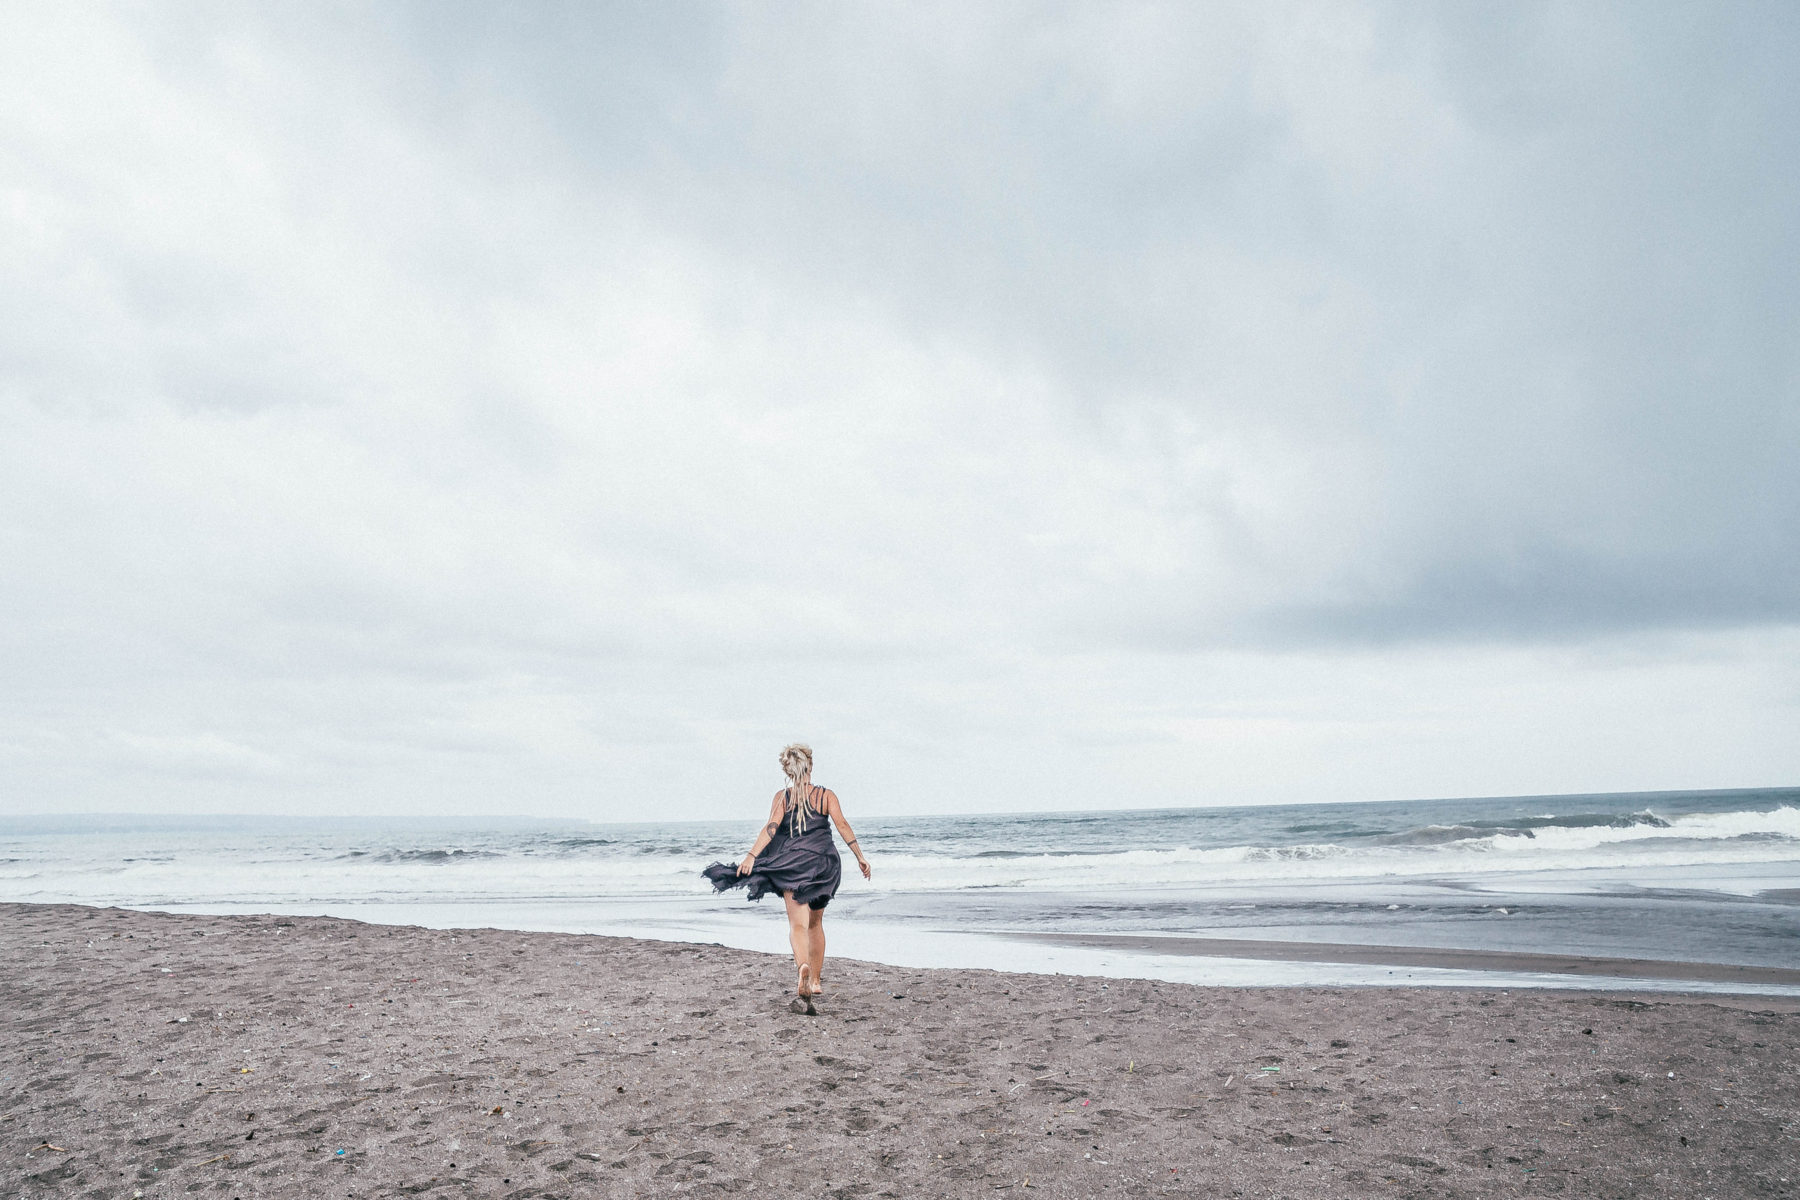 indian ocean bali beach indonesia canggu exploring the area before the storm